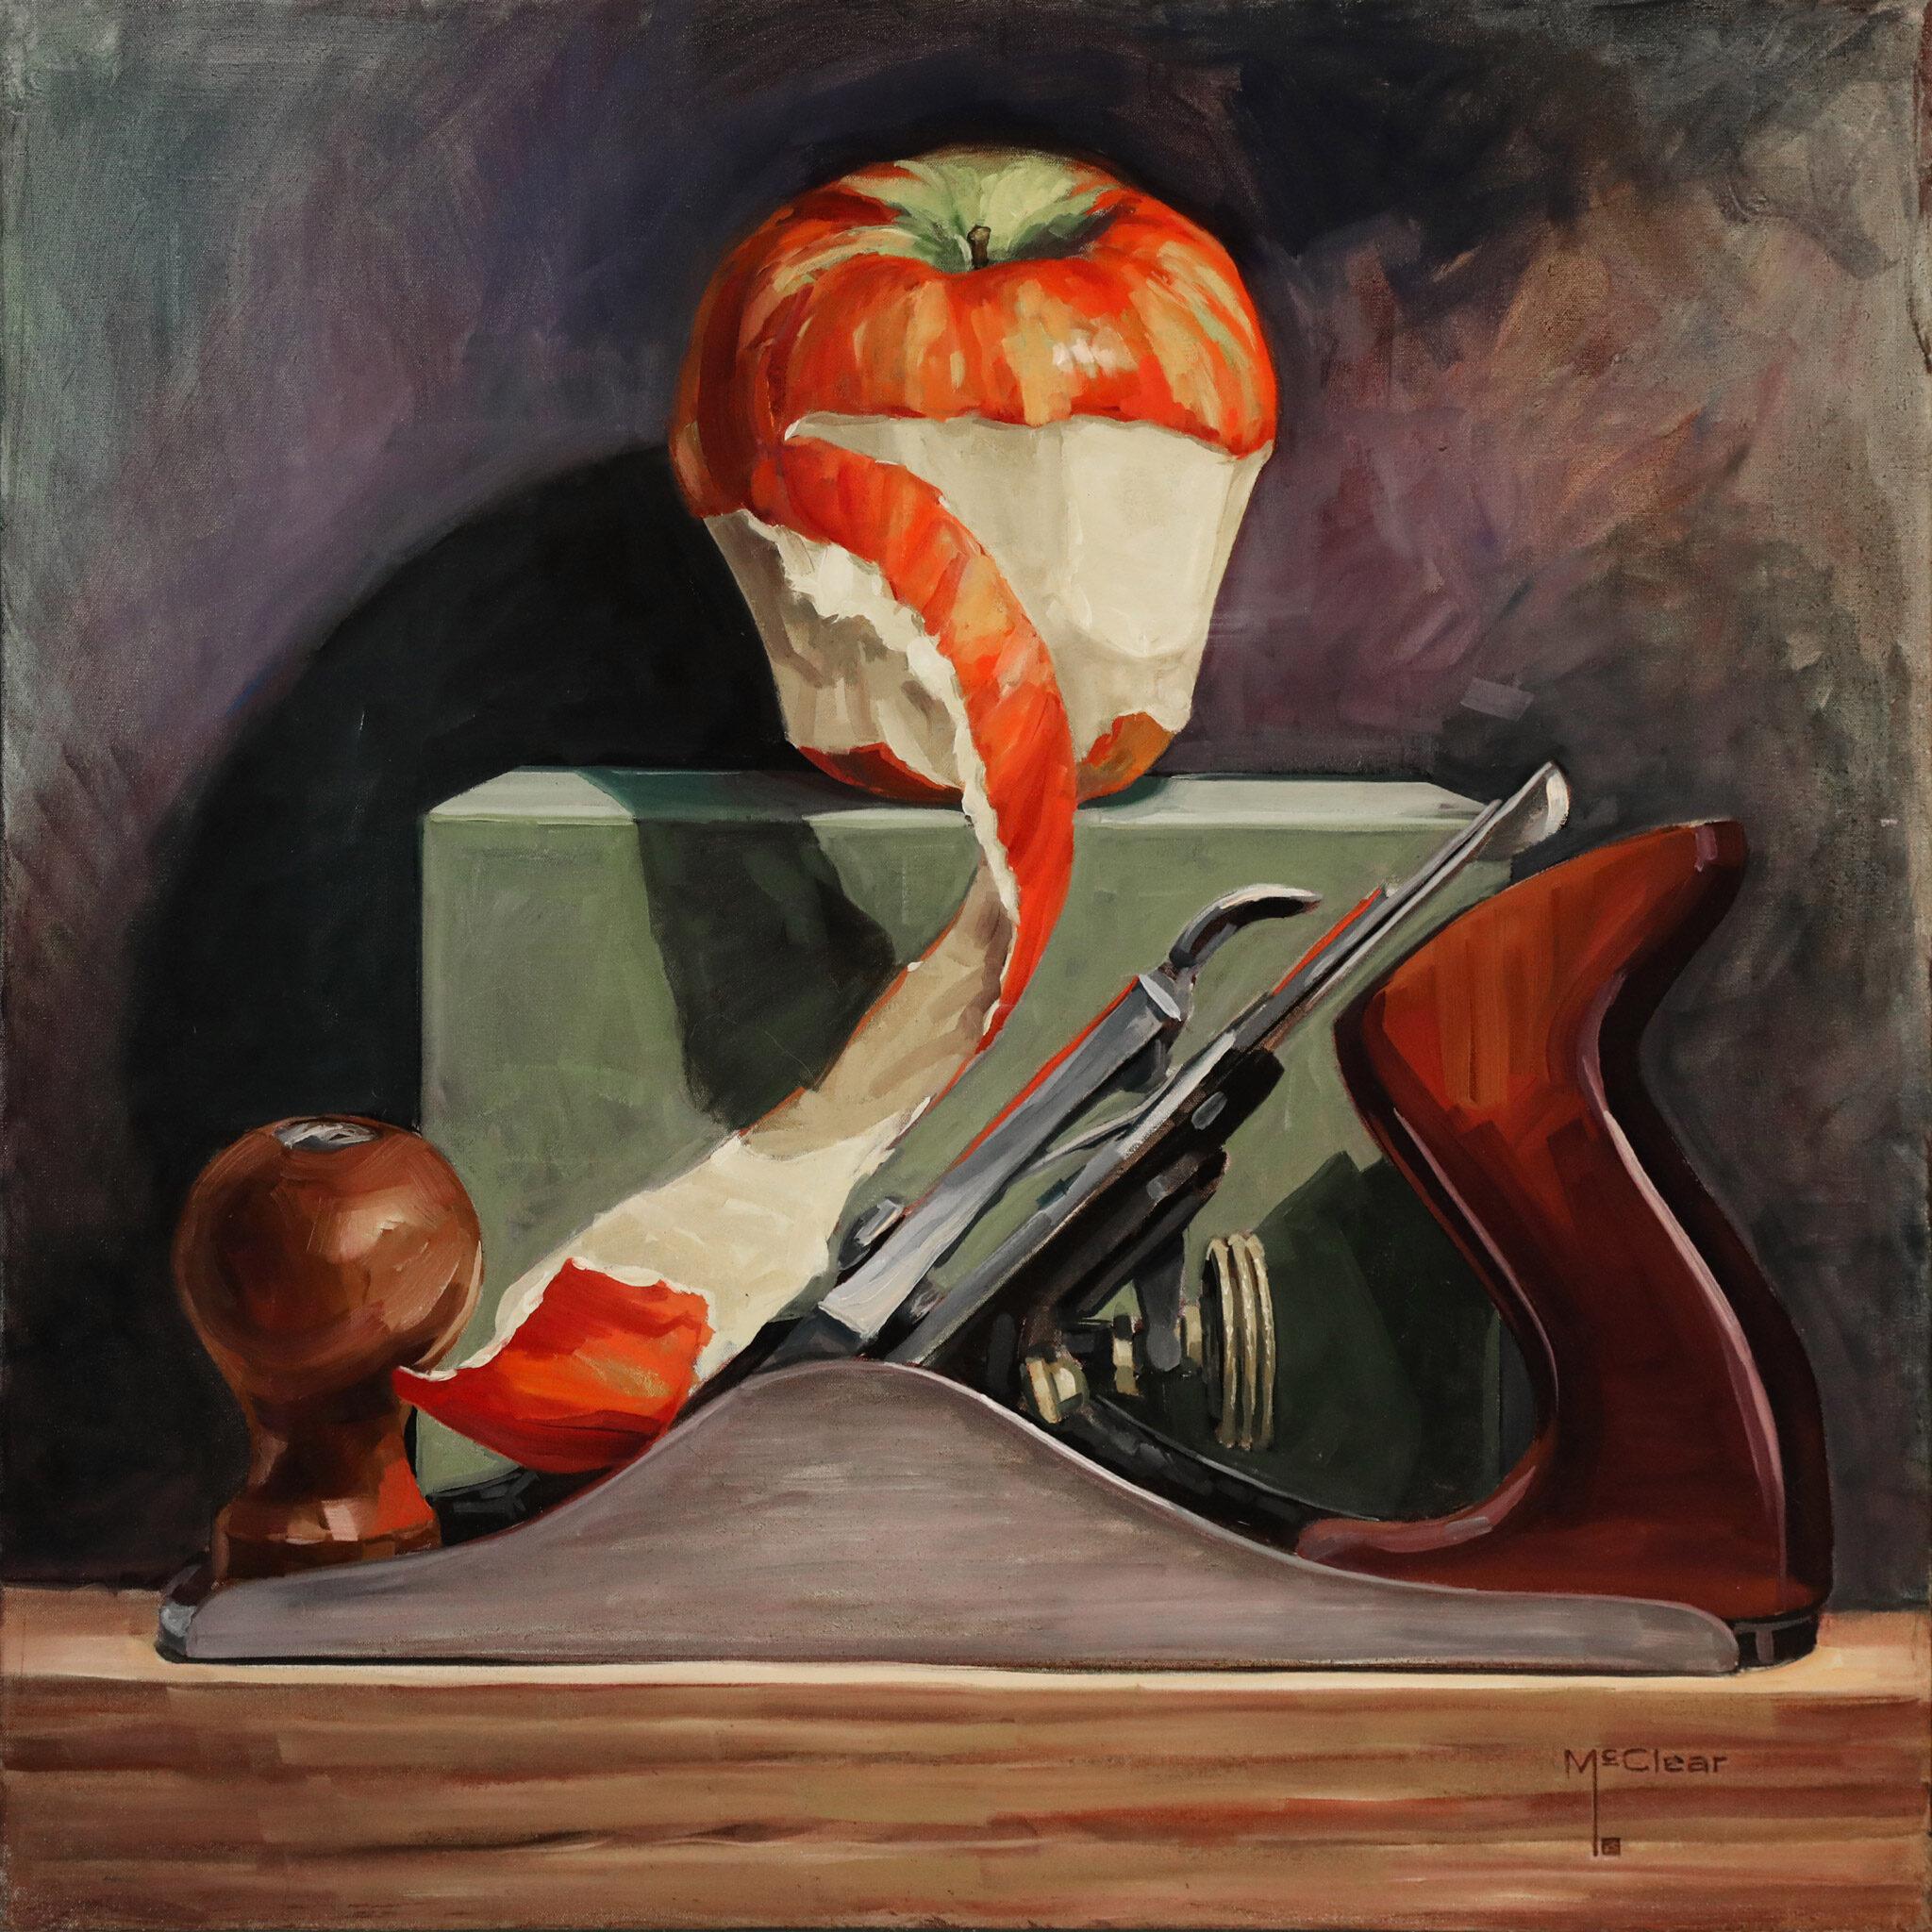 Apple Peel by: Brian McClear